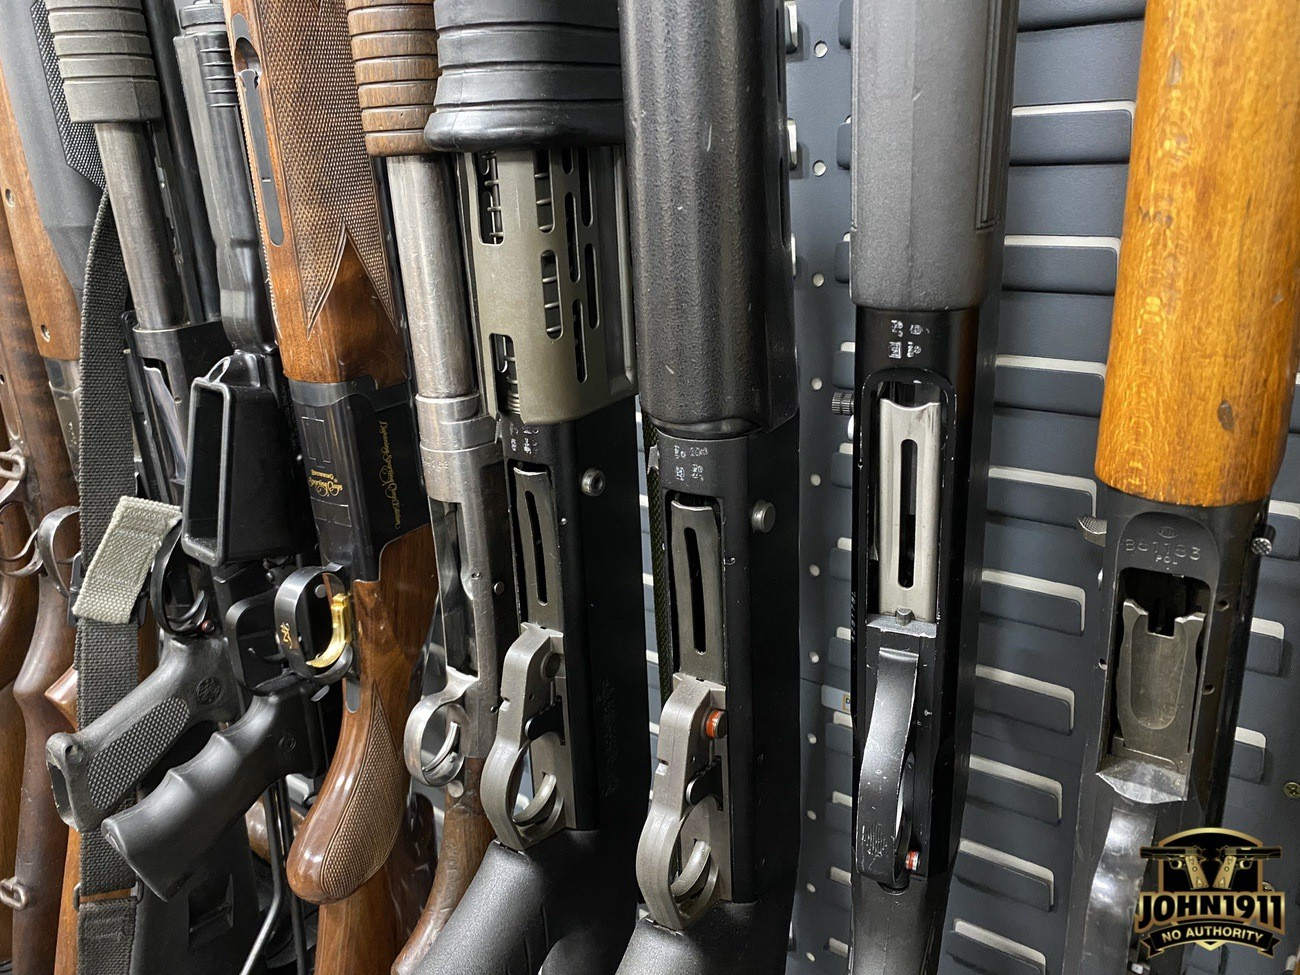 Shotgun Collection